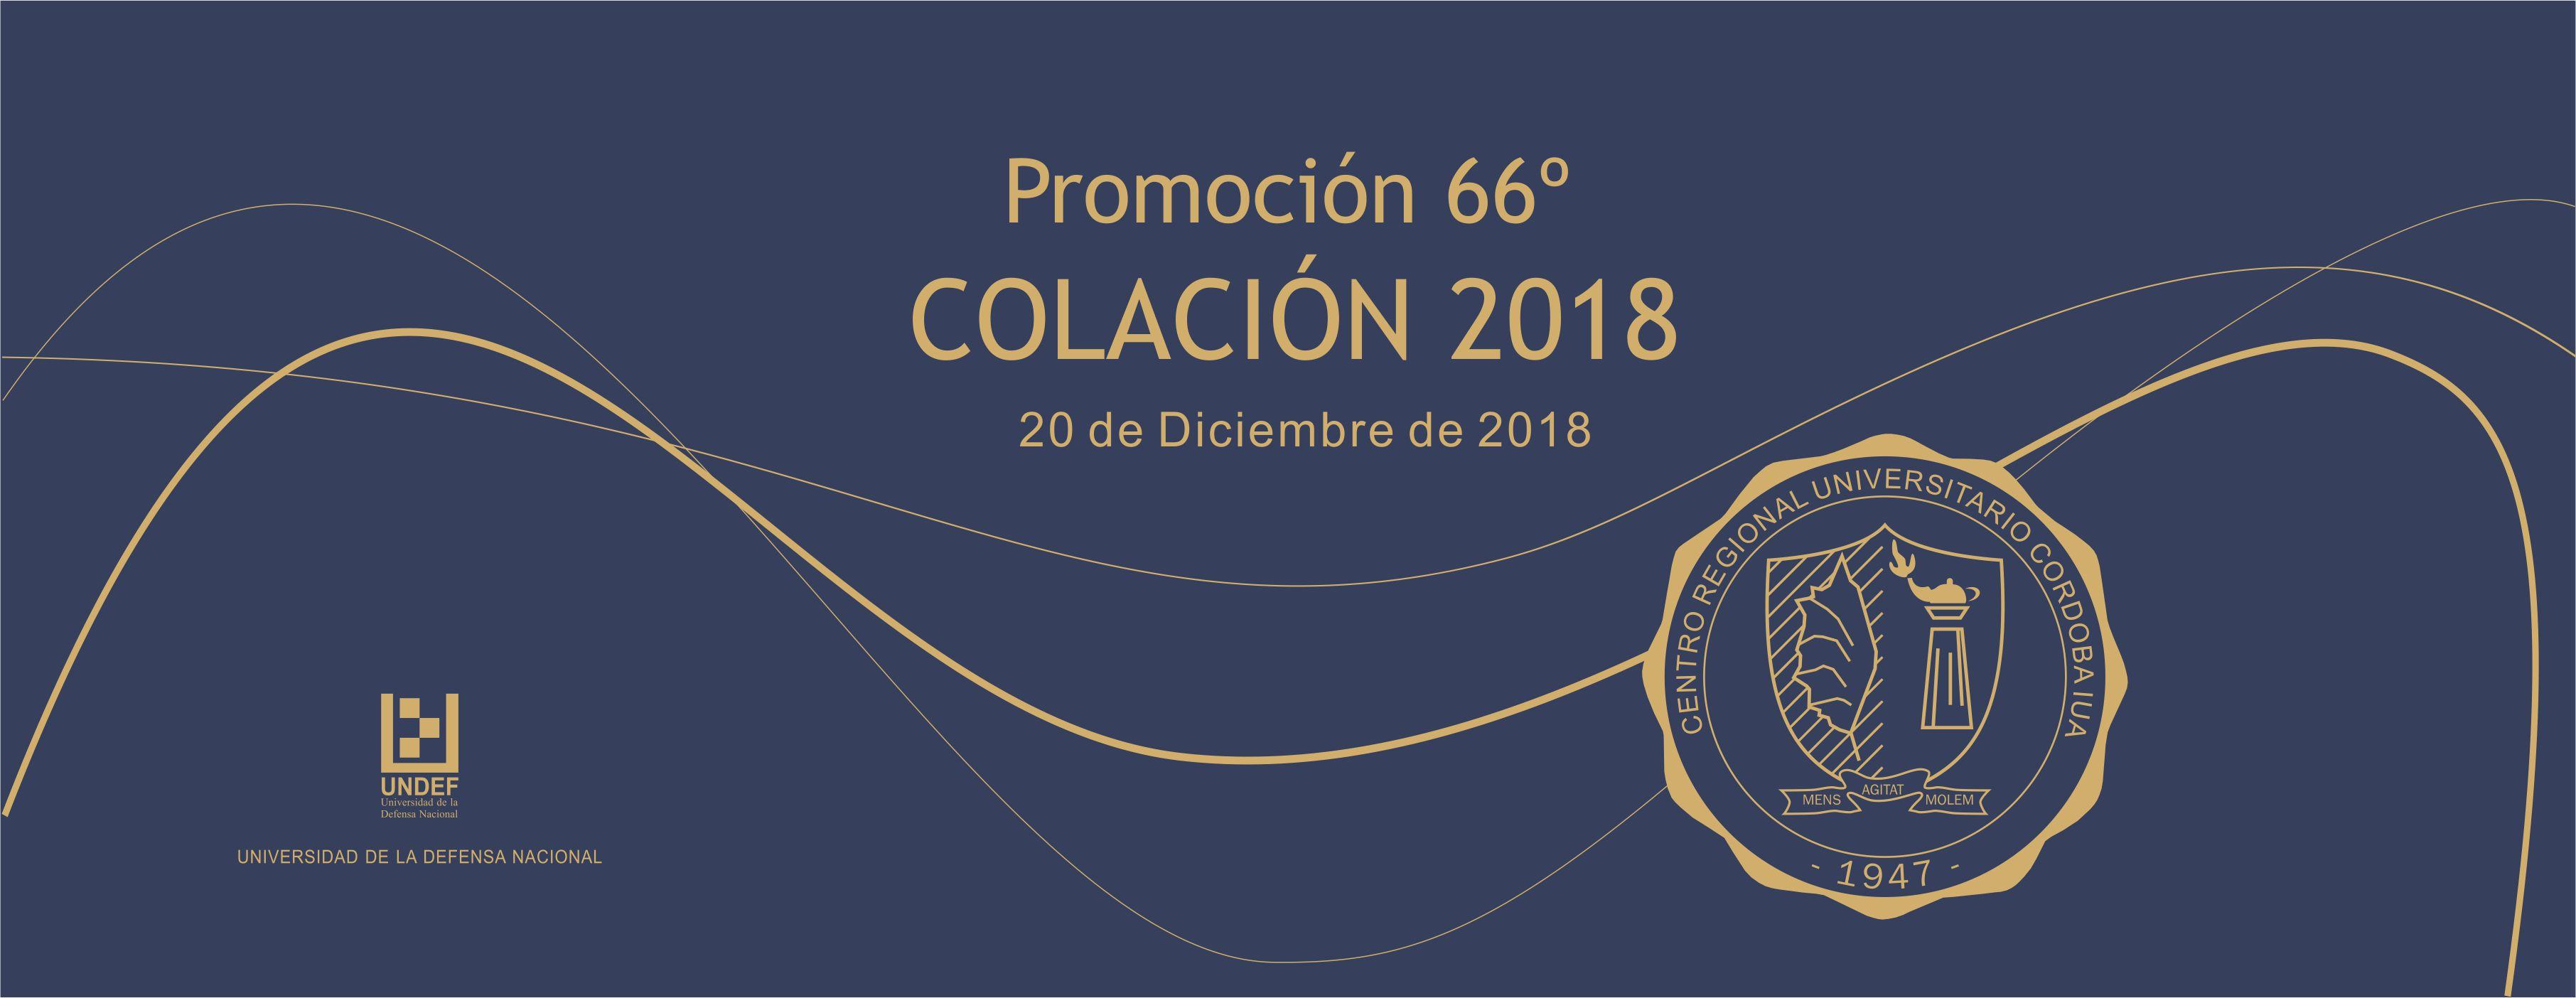 Colación de Grado Diciembre 2018 – Promoción 66º